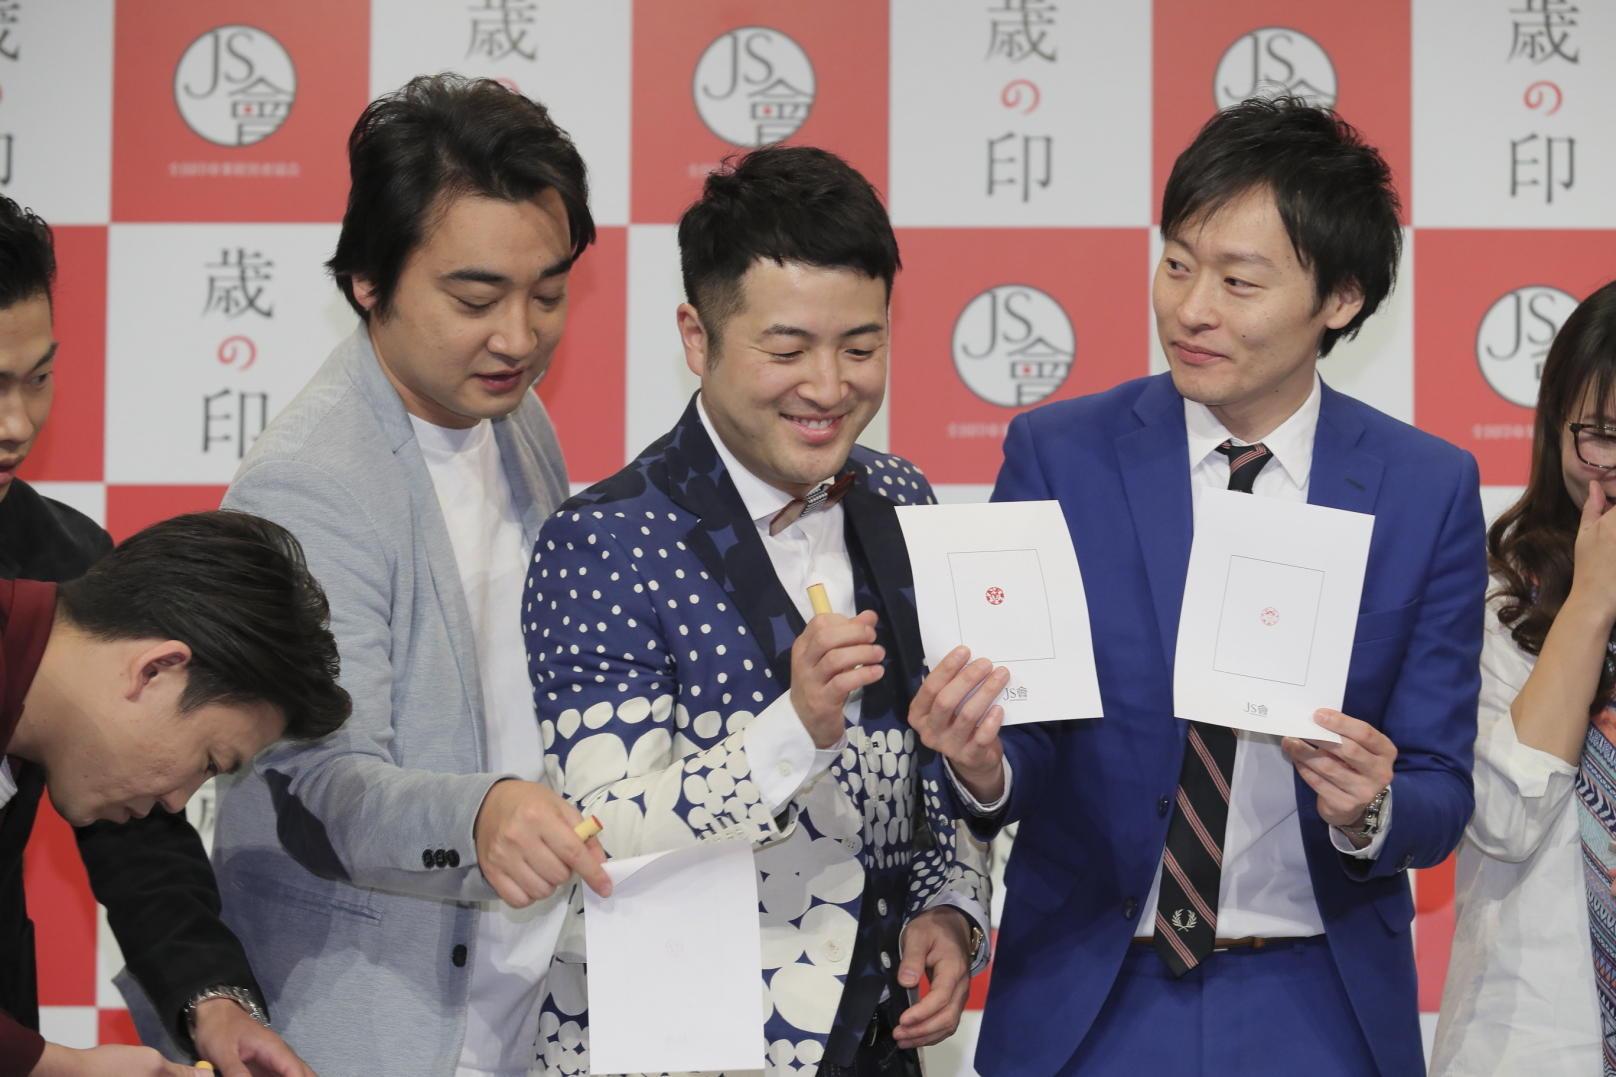 http://news.yoshimoto.co.jp/20171204171850-4dc6456e0b440334eacef2d0a296cd0c963914c3.jpg